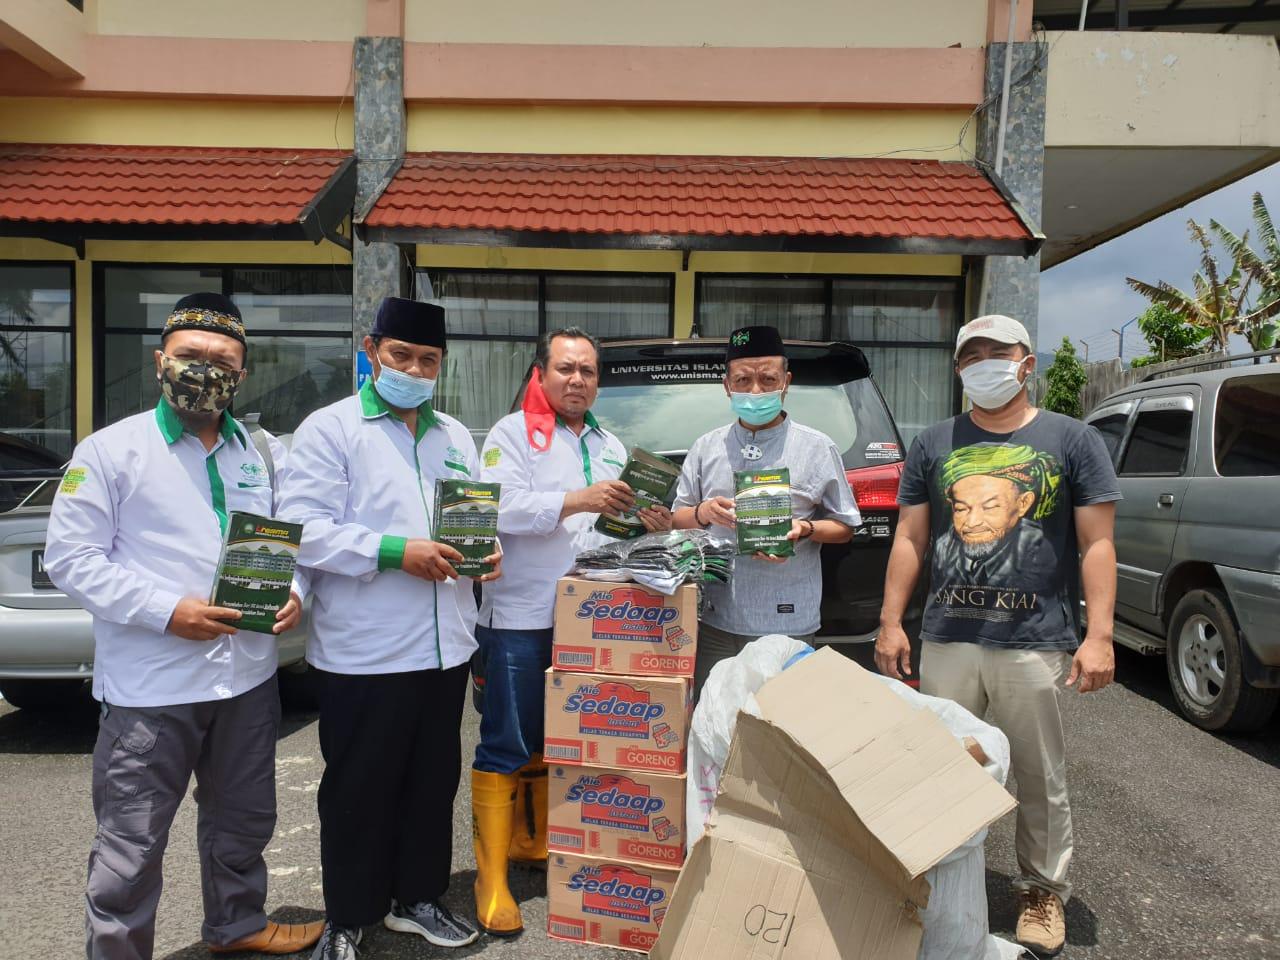 NU Kabupaten Malang Peduli merupakan program yang digagas untuk membantu para korban bencana di wilayah Kabupaten Malang. (Foto: Dokumen/NU Kabupaten Malang Peduli) tugu jatim